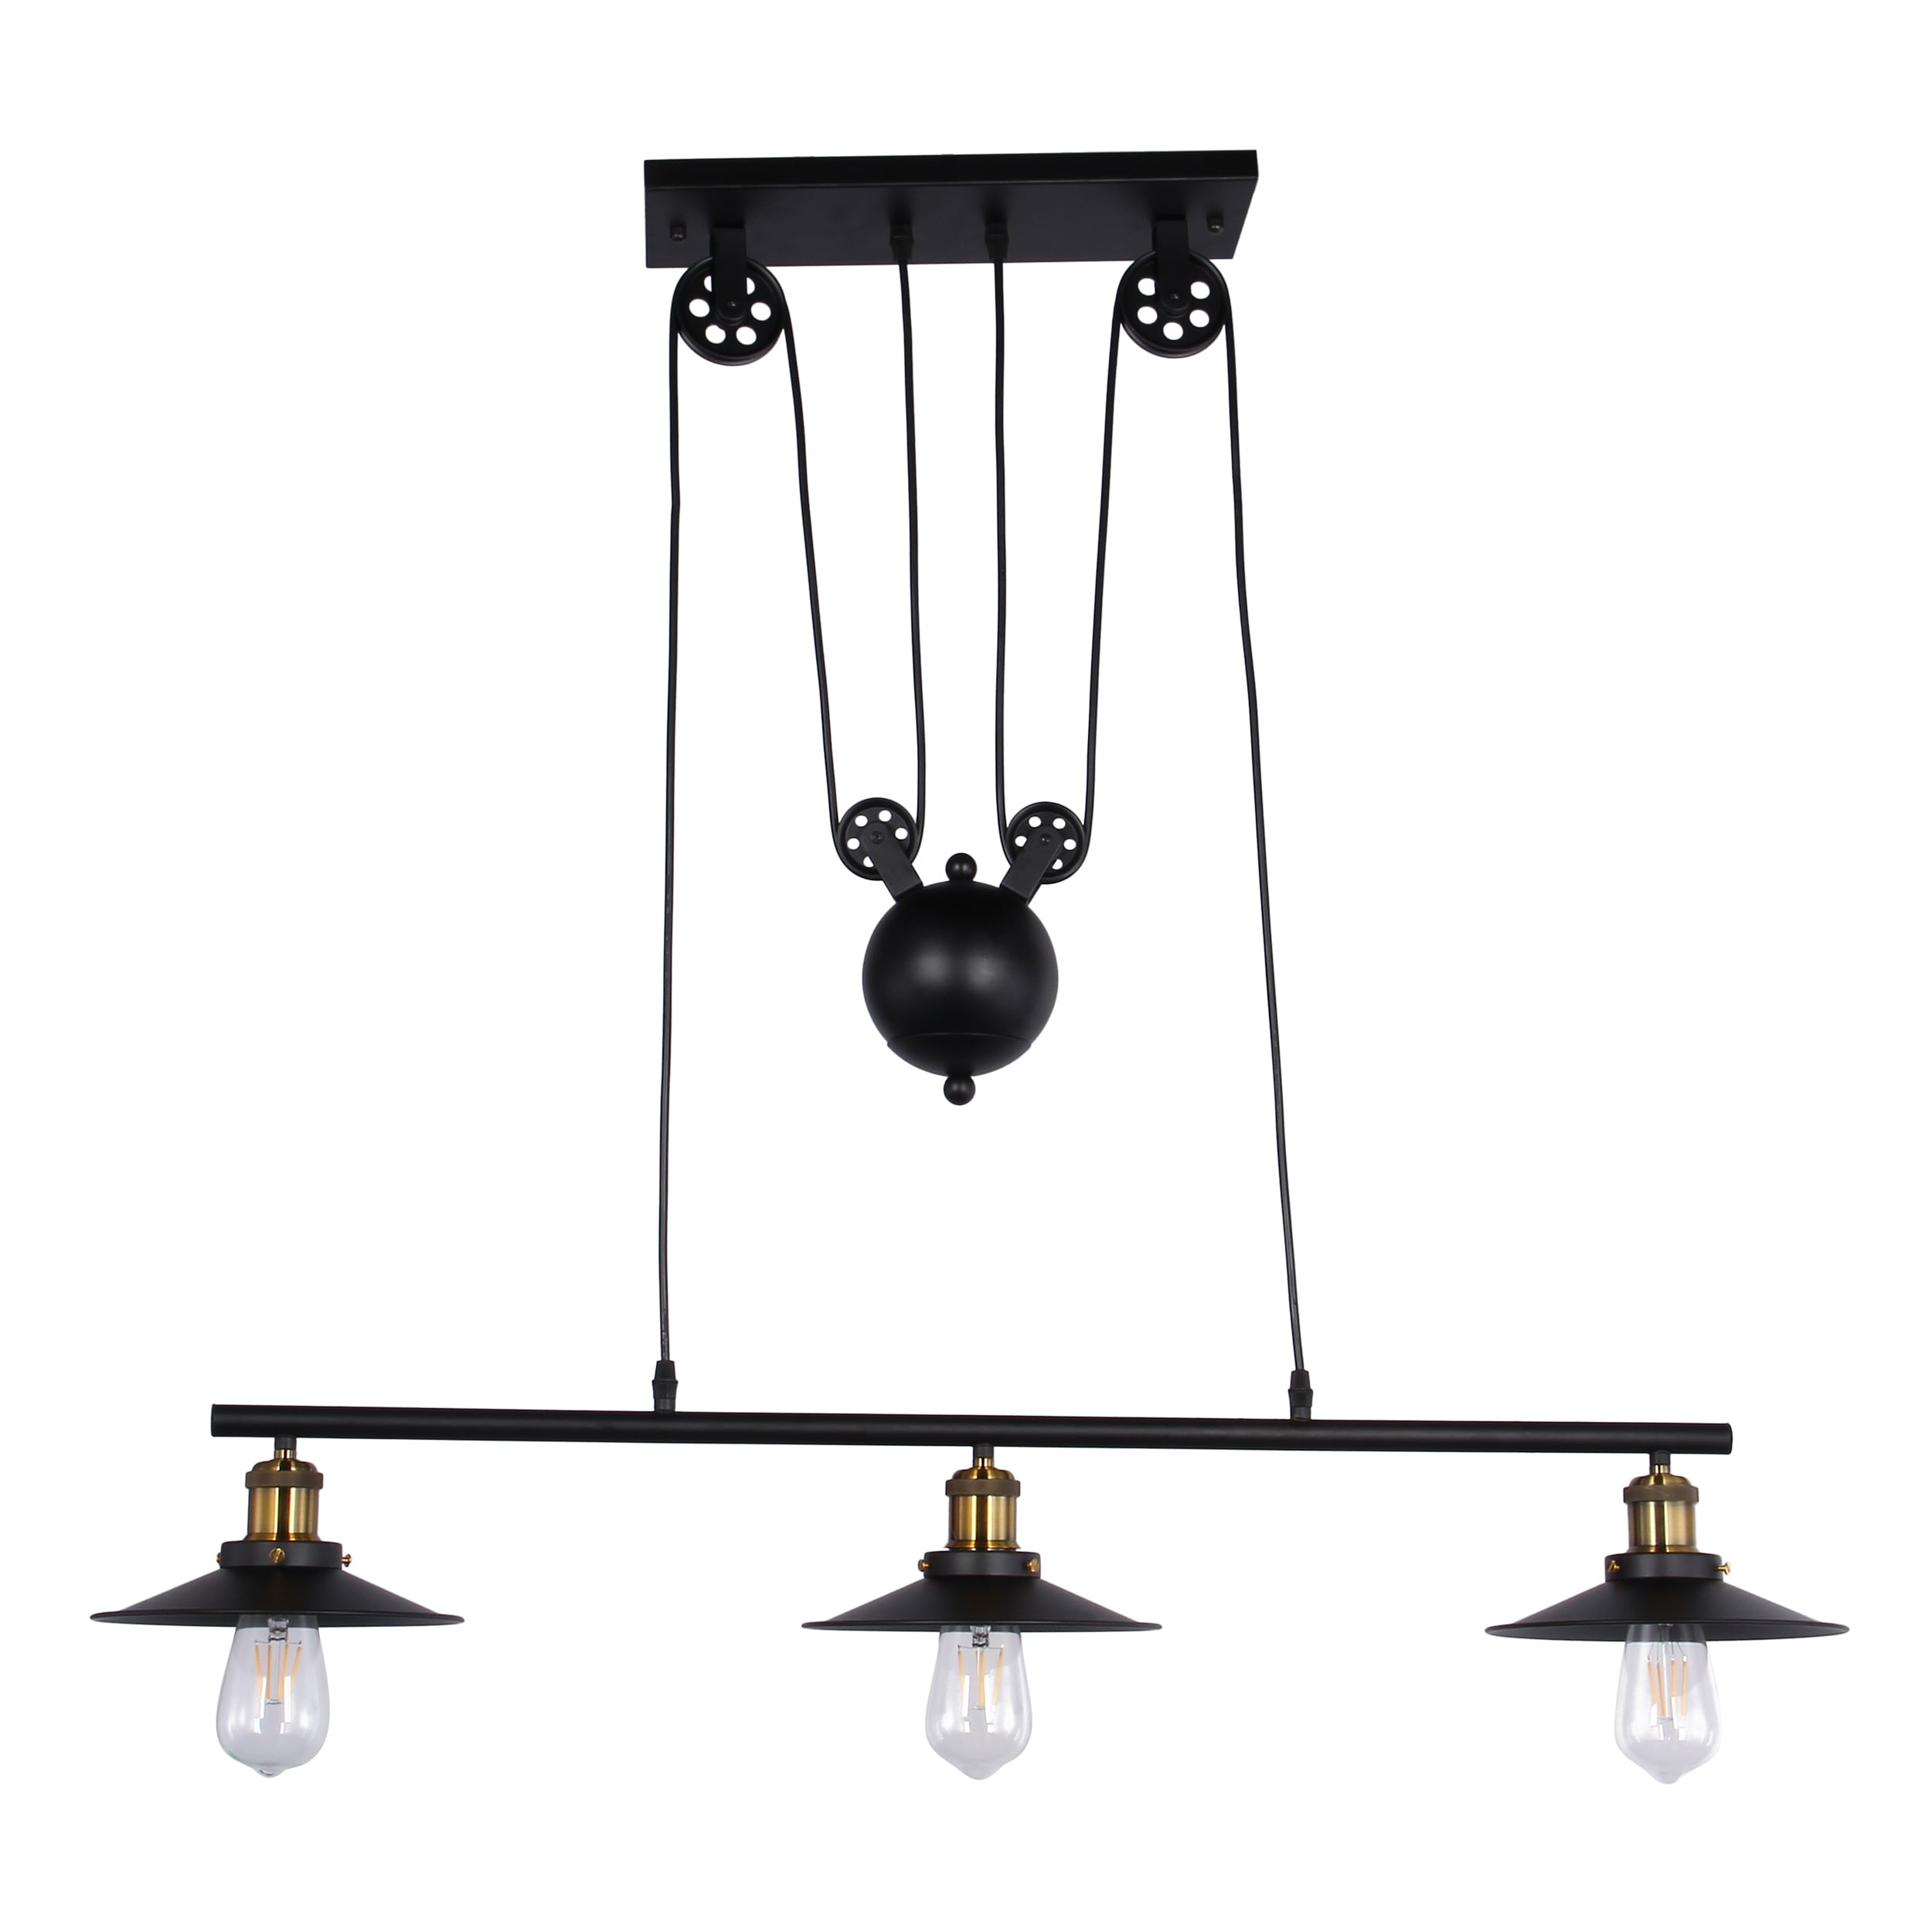 Darleen 3 light black 42 inch chandelier includes edison bulbs darleen 3 light black 42 inch chandelier includes edison bulbs free shipping today overstock 25729910 aloadofball Images